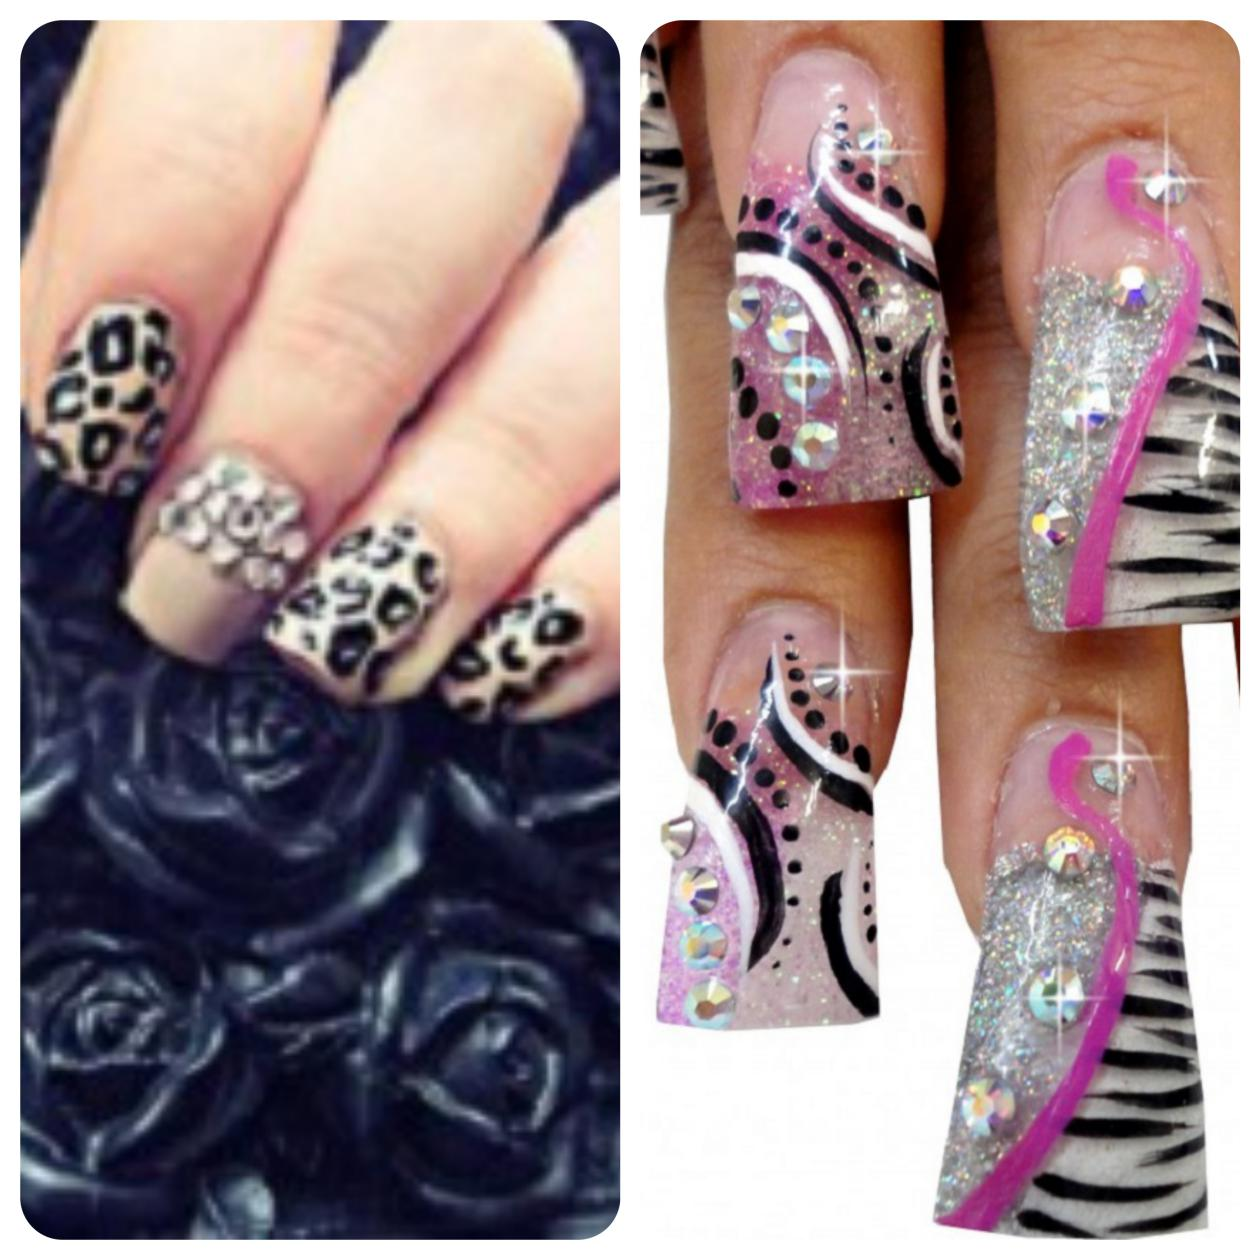 Animal_style_nail_art_new_design